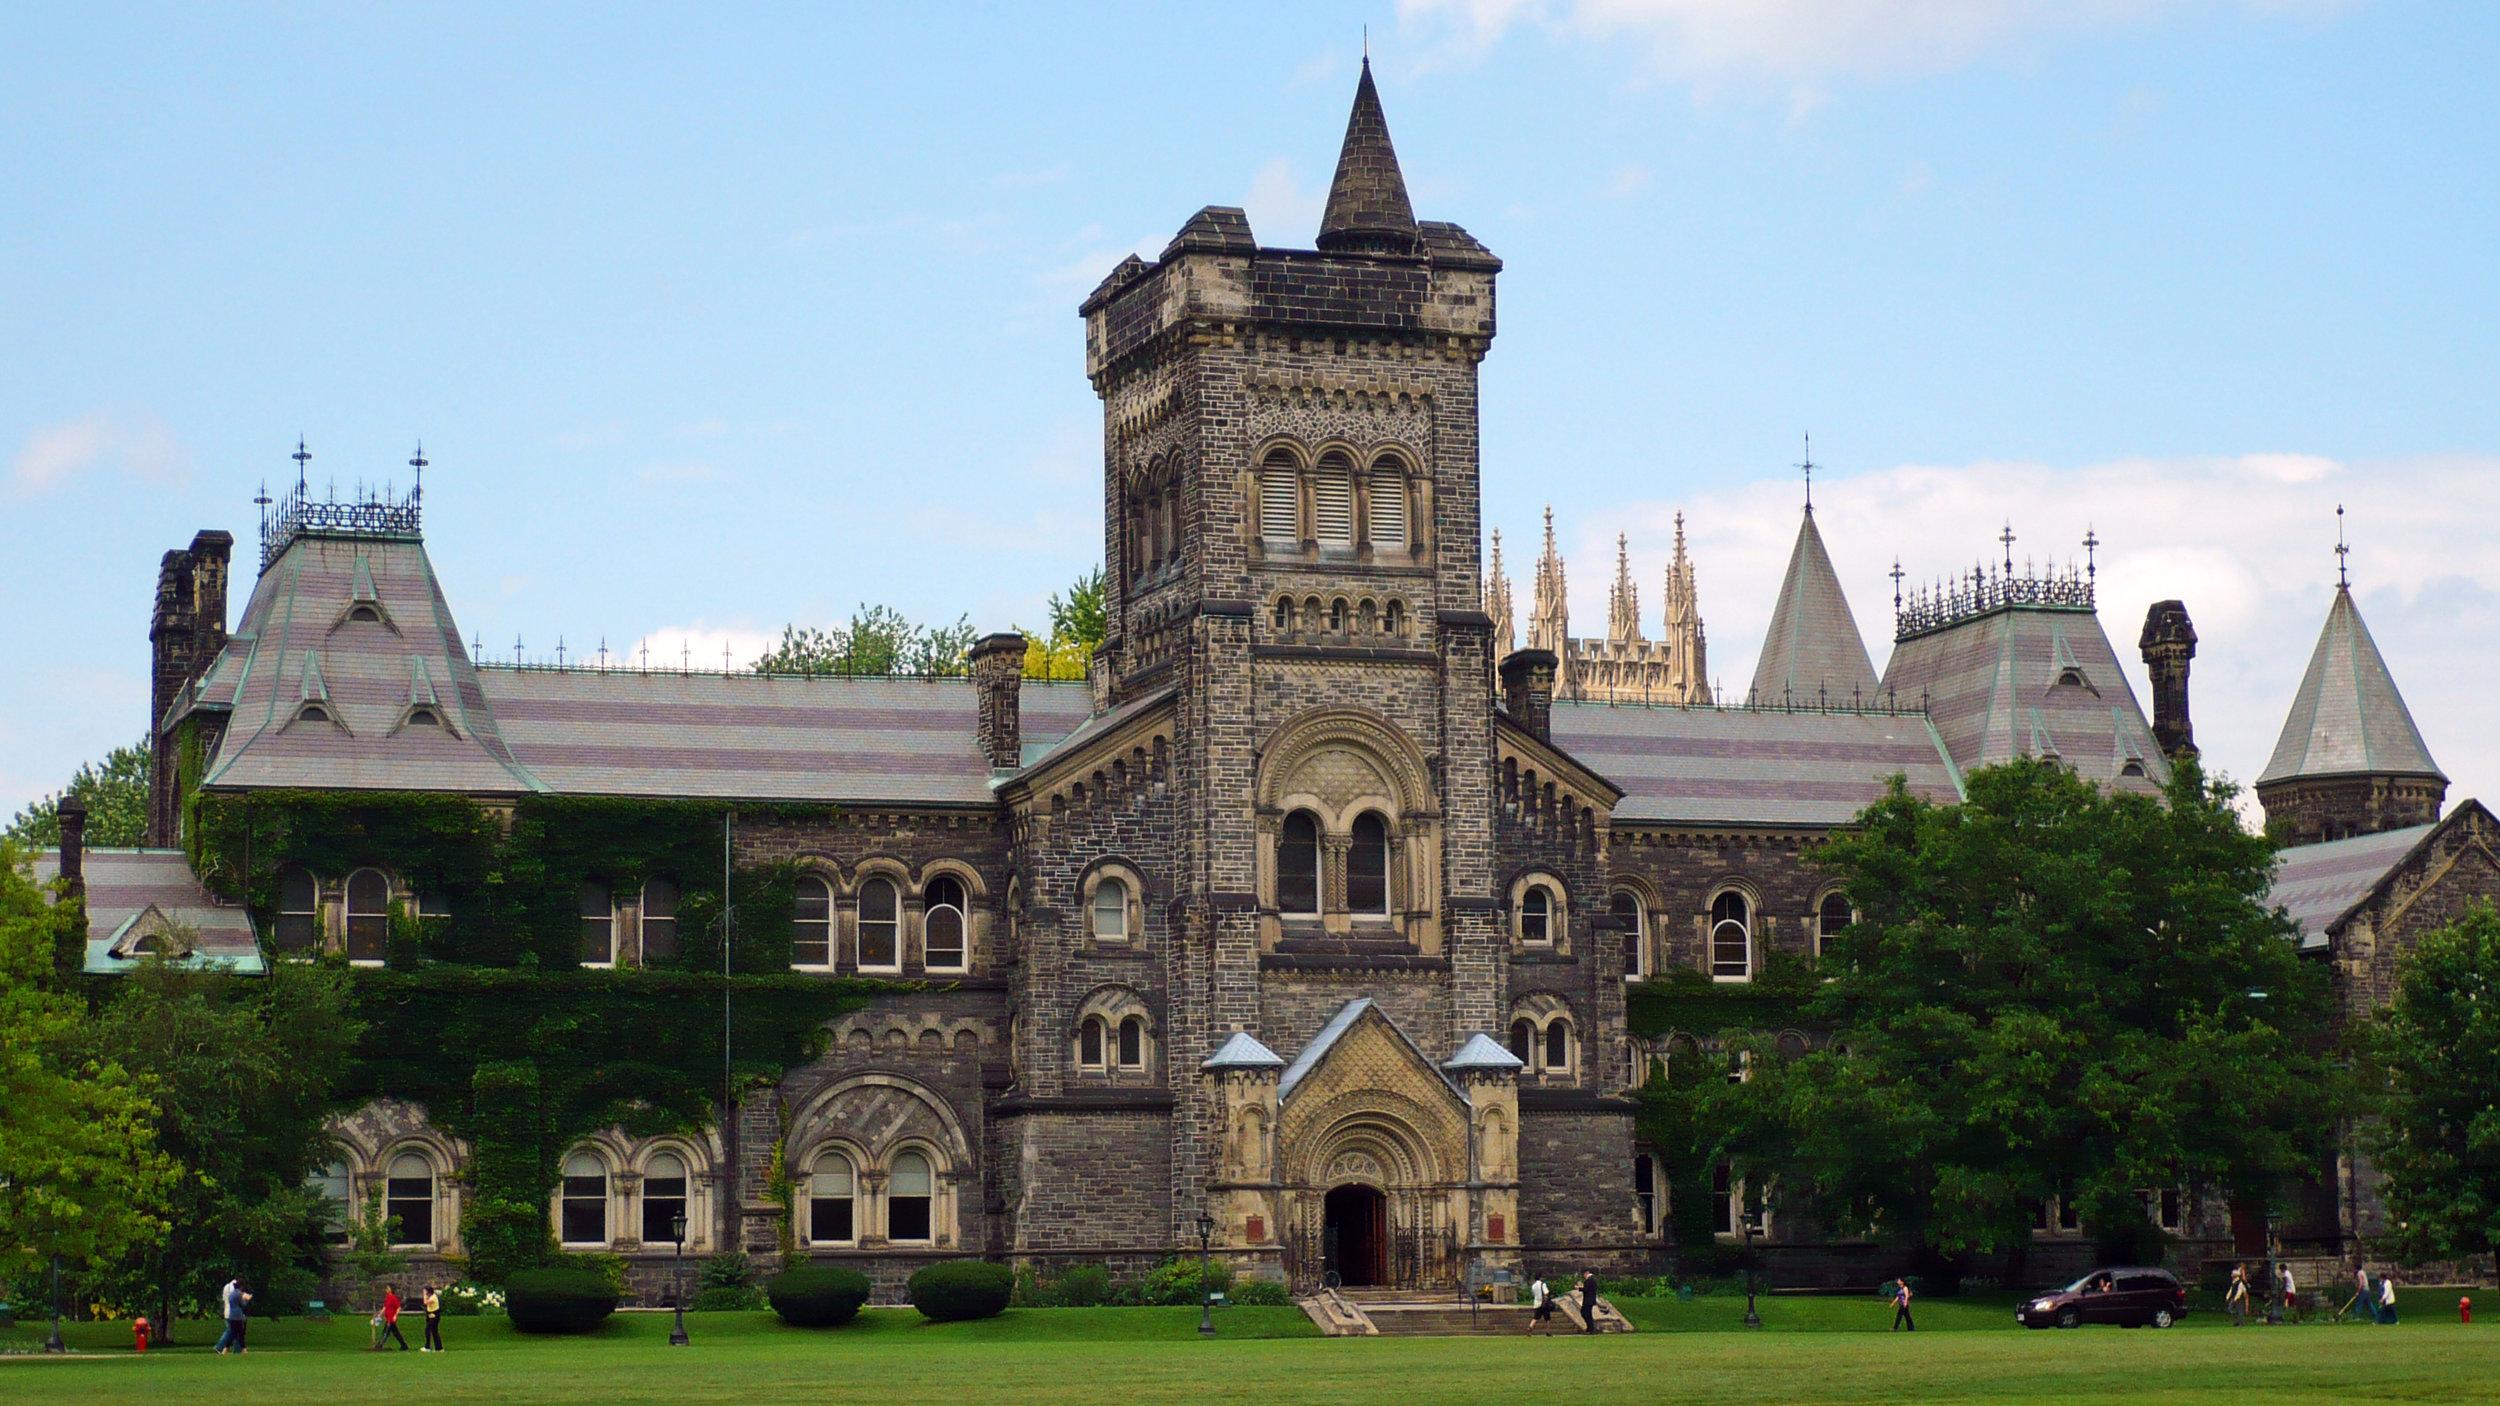 Image credit - University of Toronto